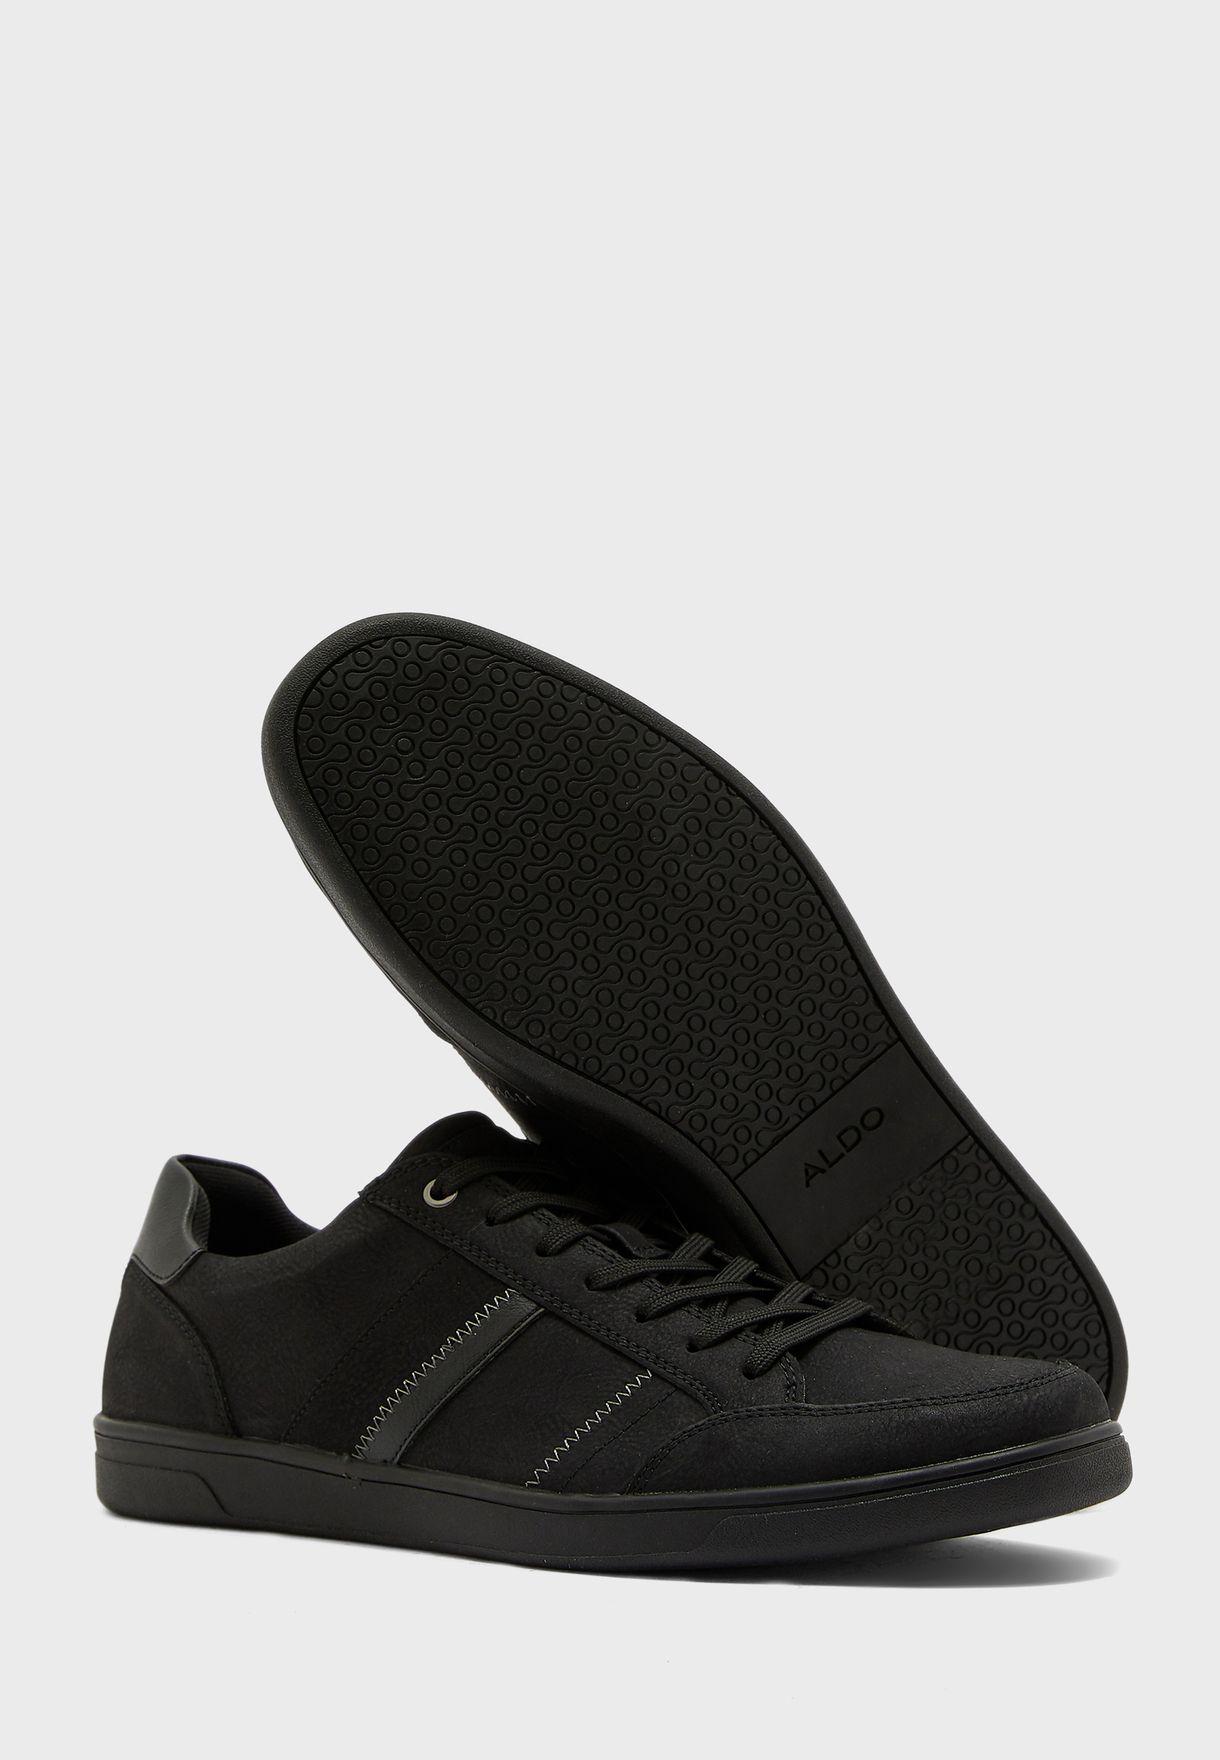 Dunkeld Sneakers